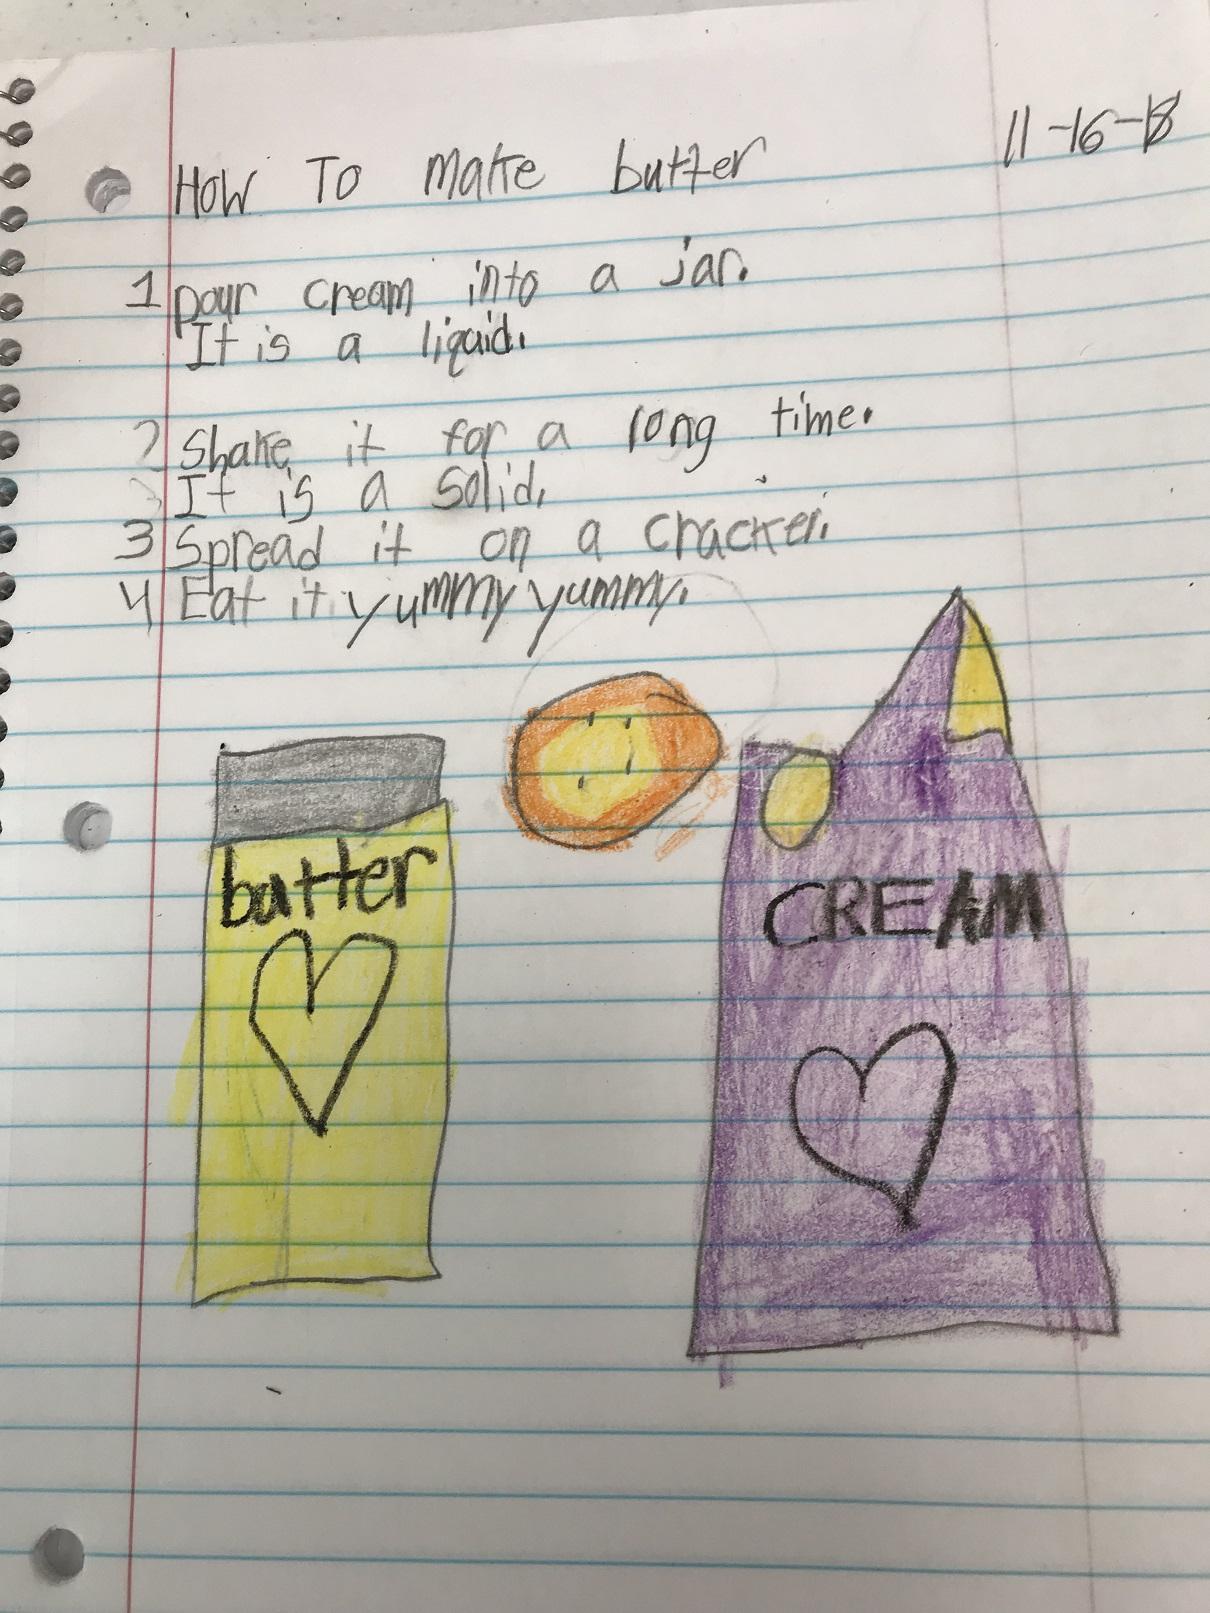 Making butter 2 Diane.jpg